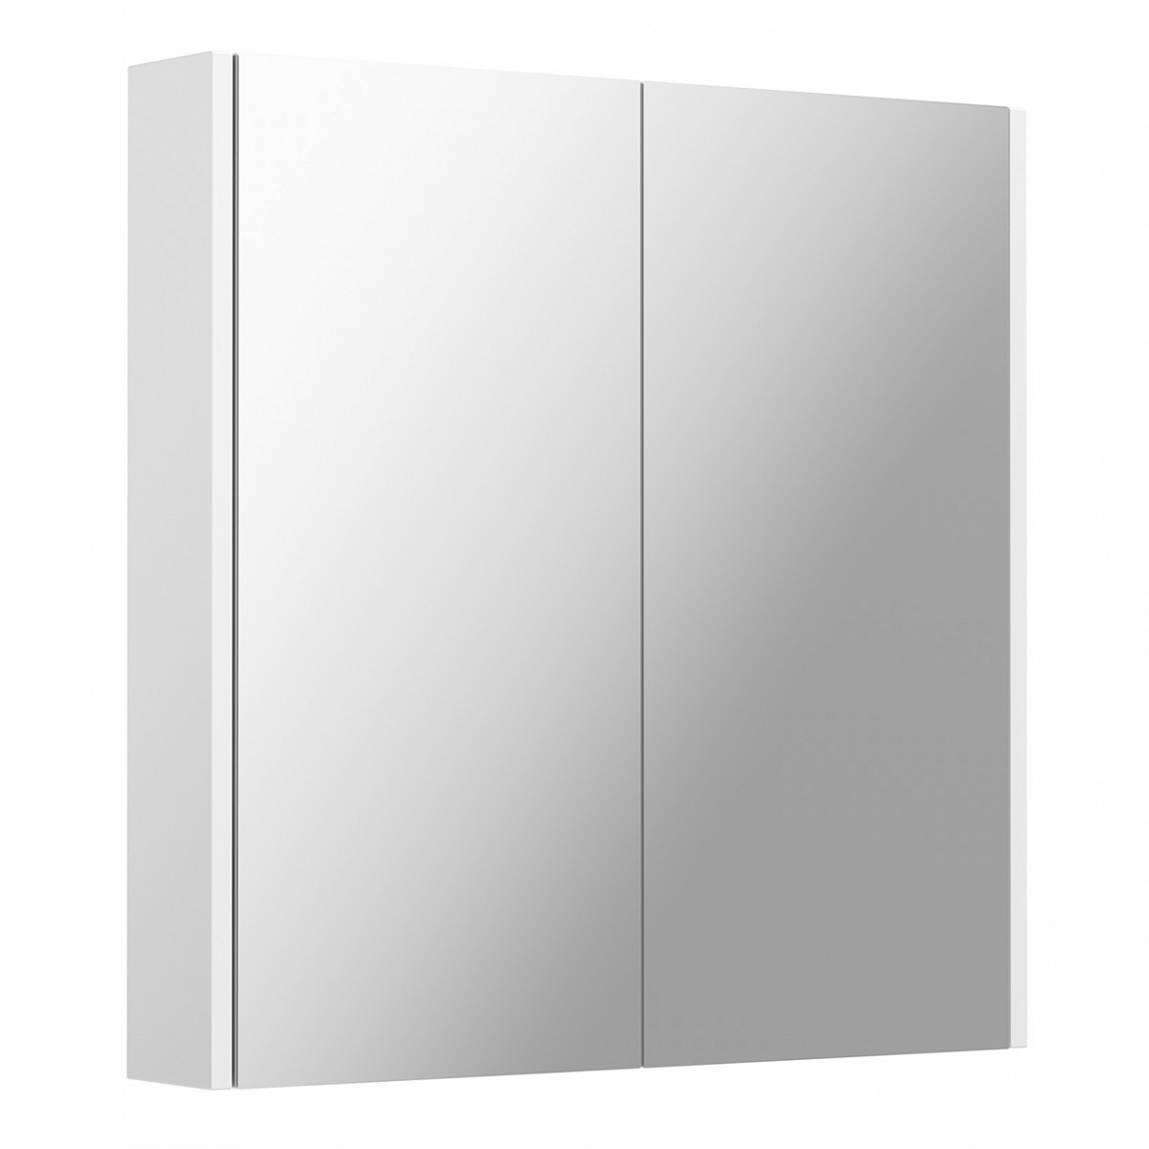 White 2 Door Bathroom Mirror Cabinet VictoriaPlum.com